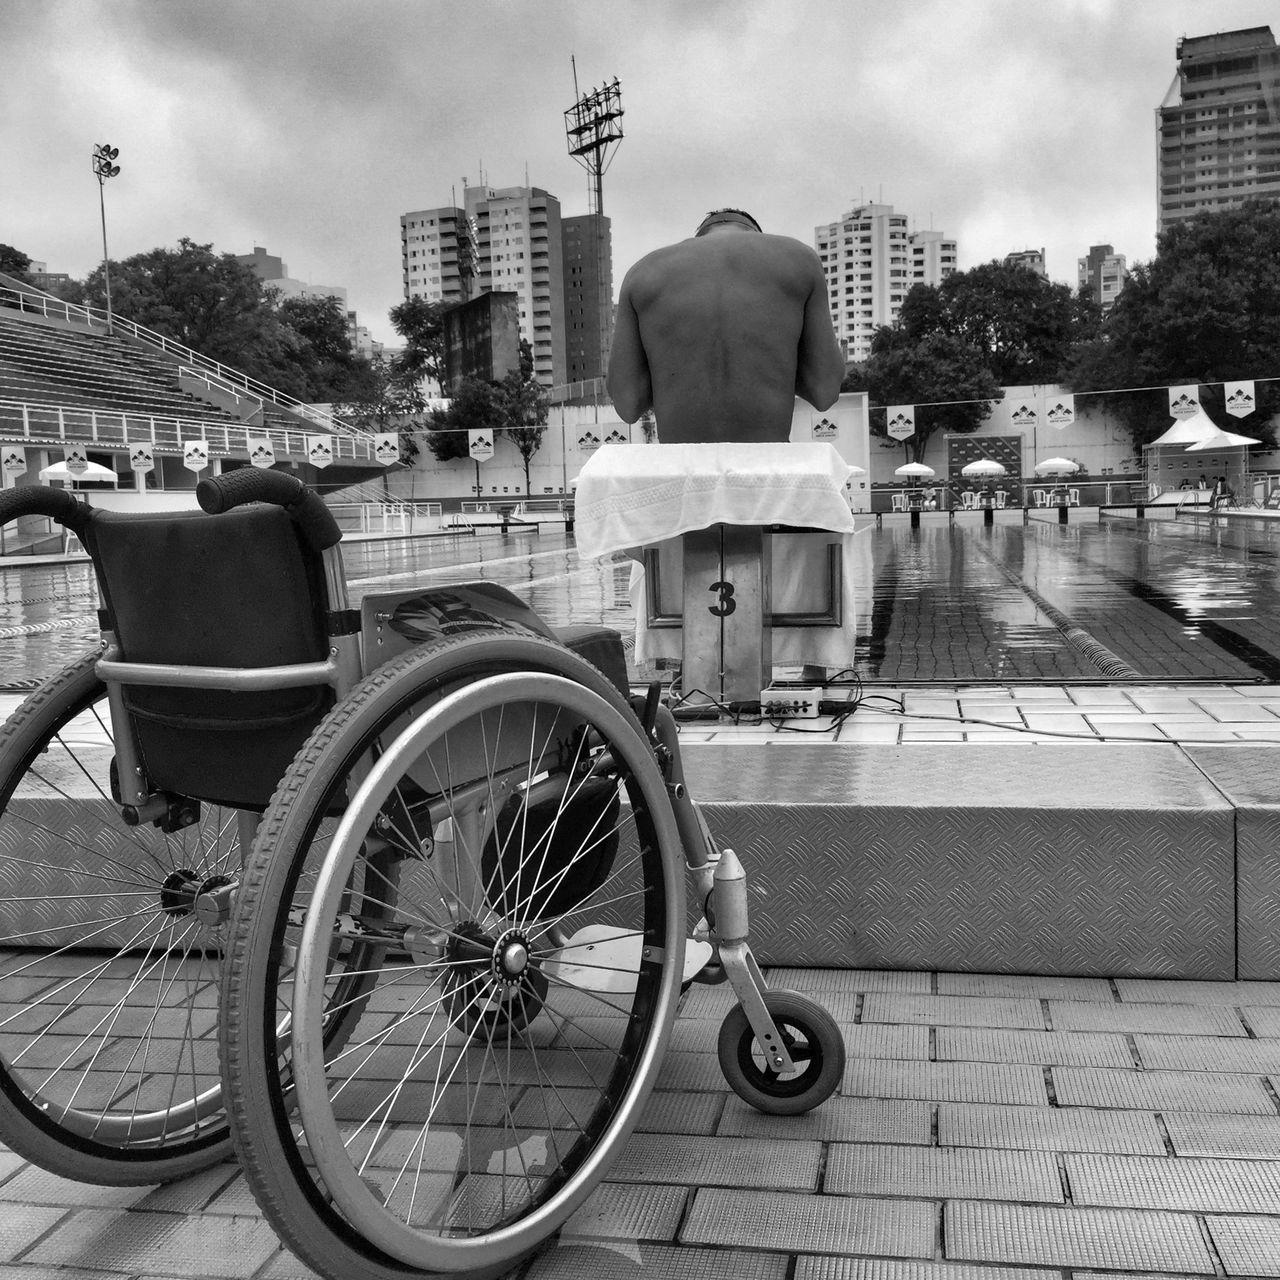 Paralimpic Games Superação2016 Esporte Paralimpico Paralimpics